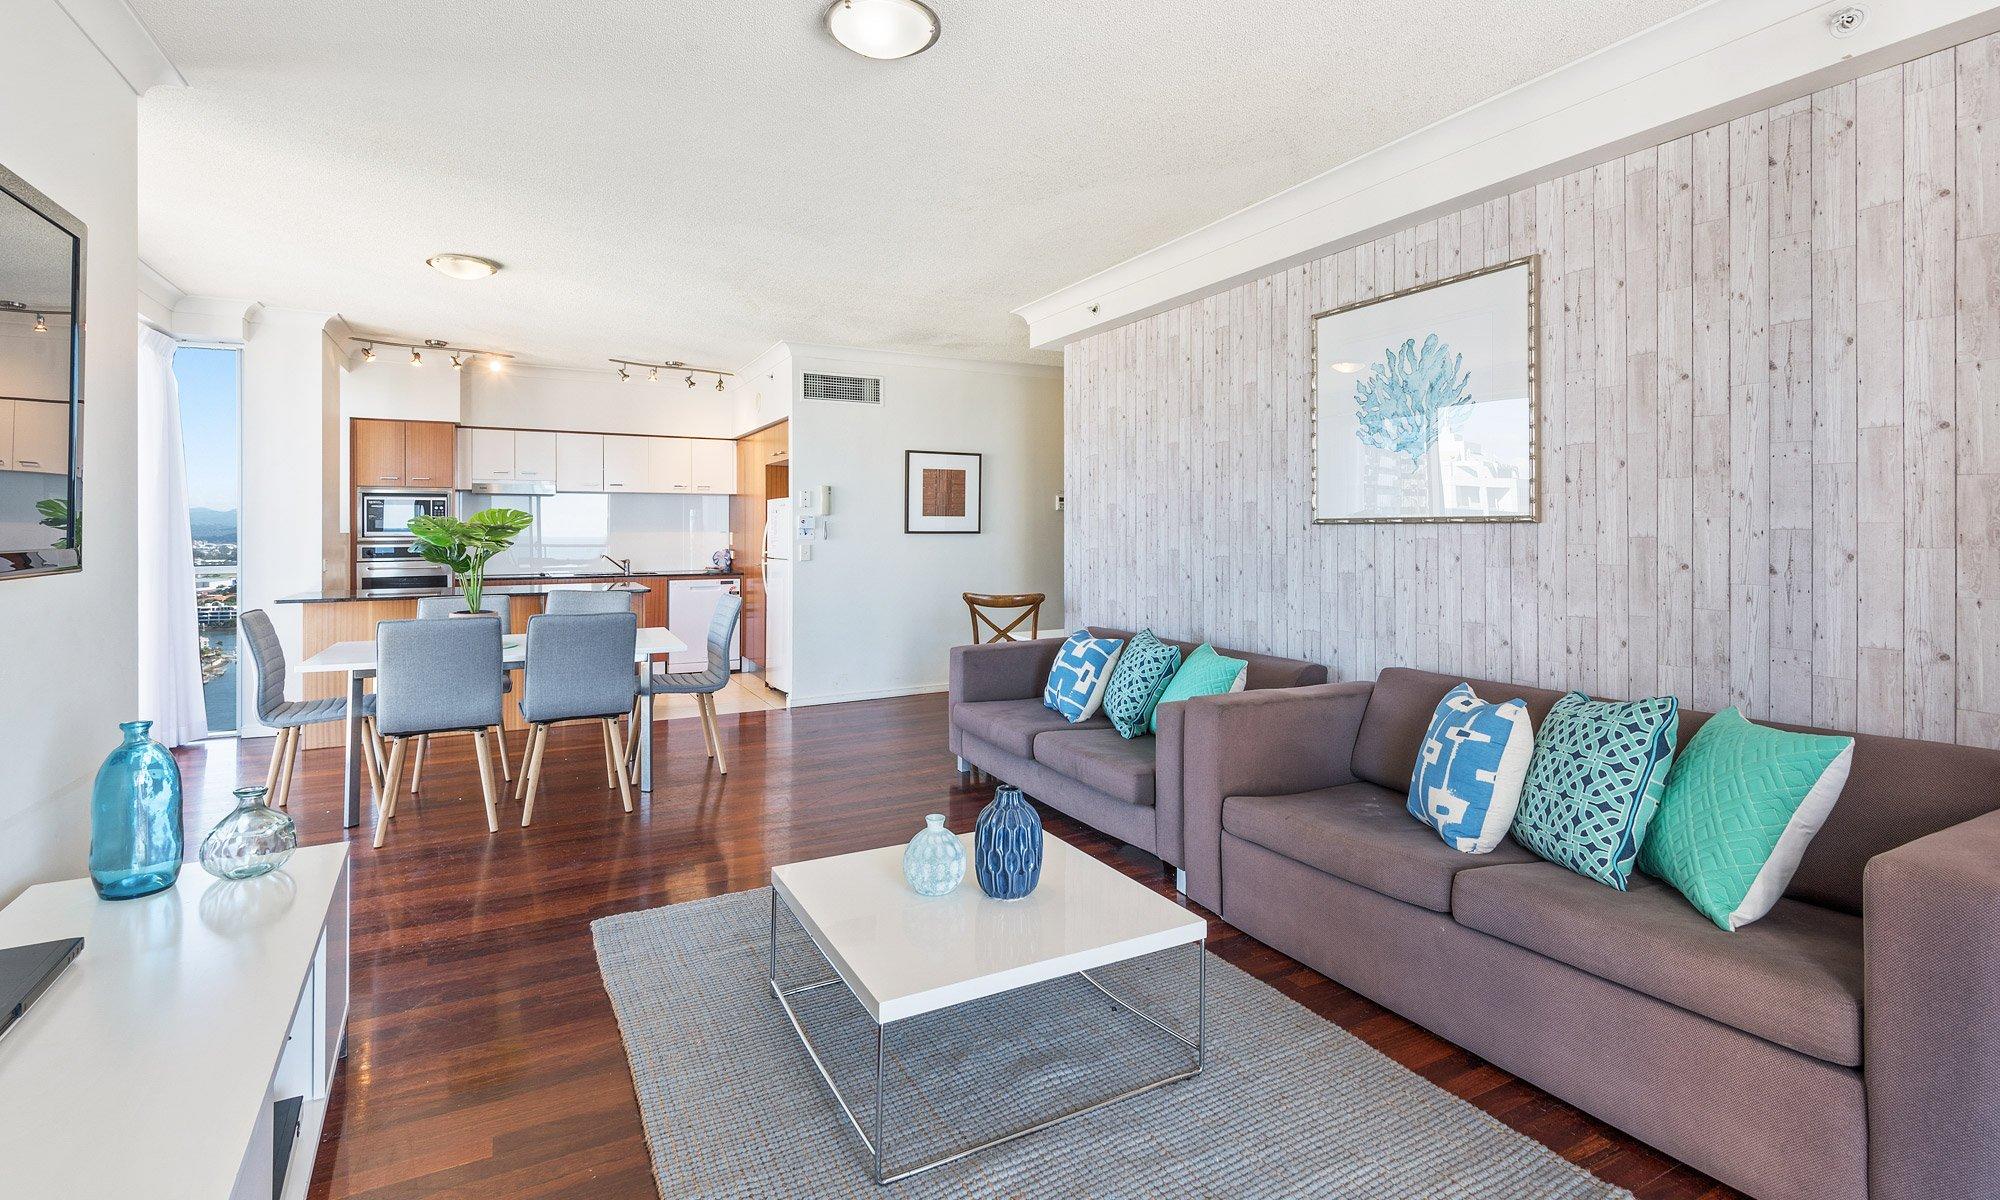 Gold Coast real estate for sale Chevron Renaissance 1264 living room